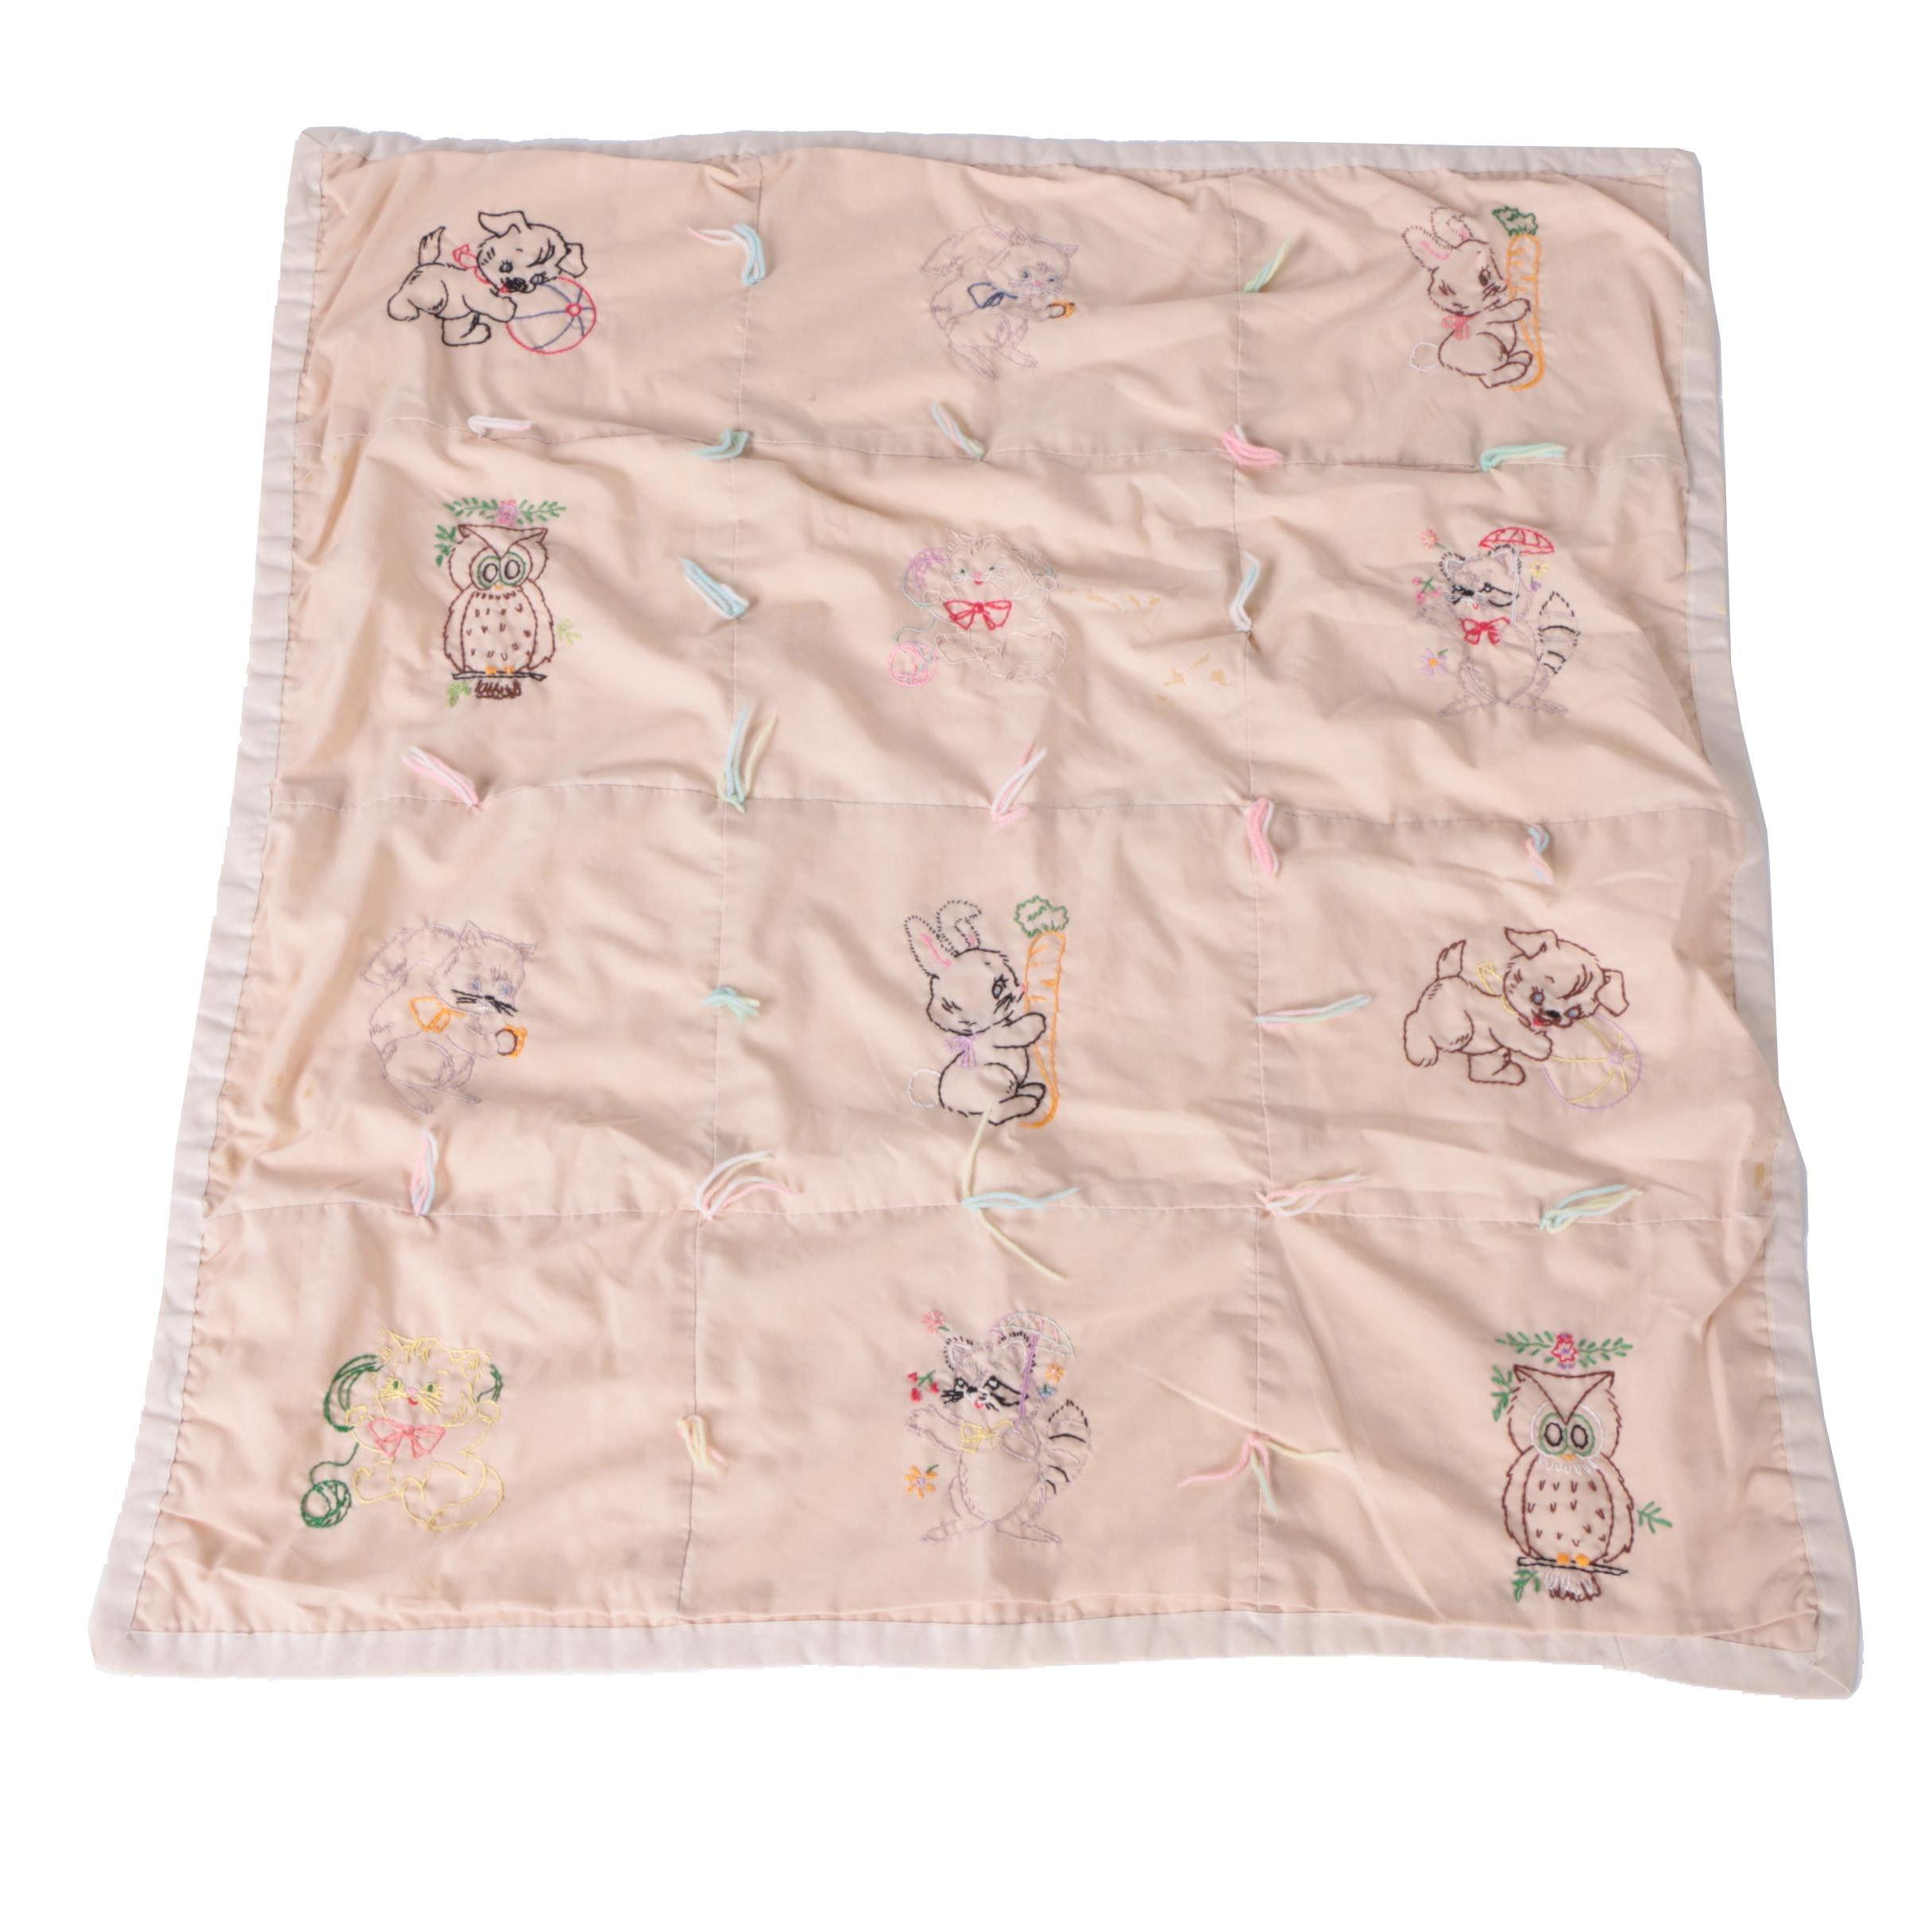 Children's Blanket with Embroidered Animals